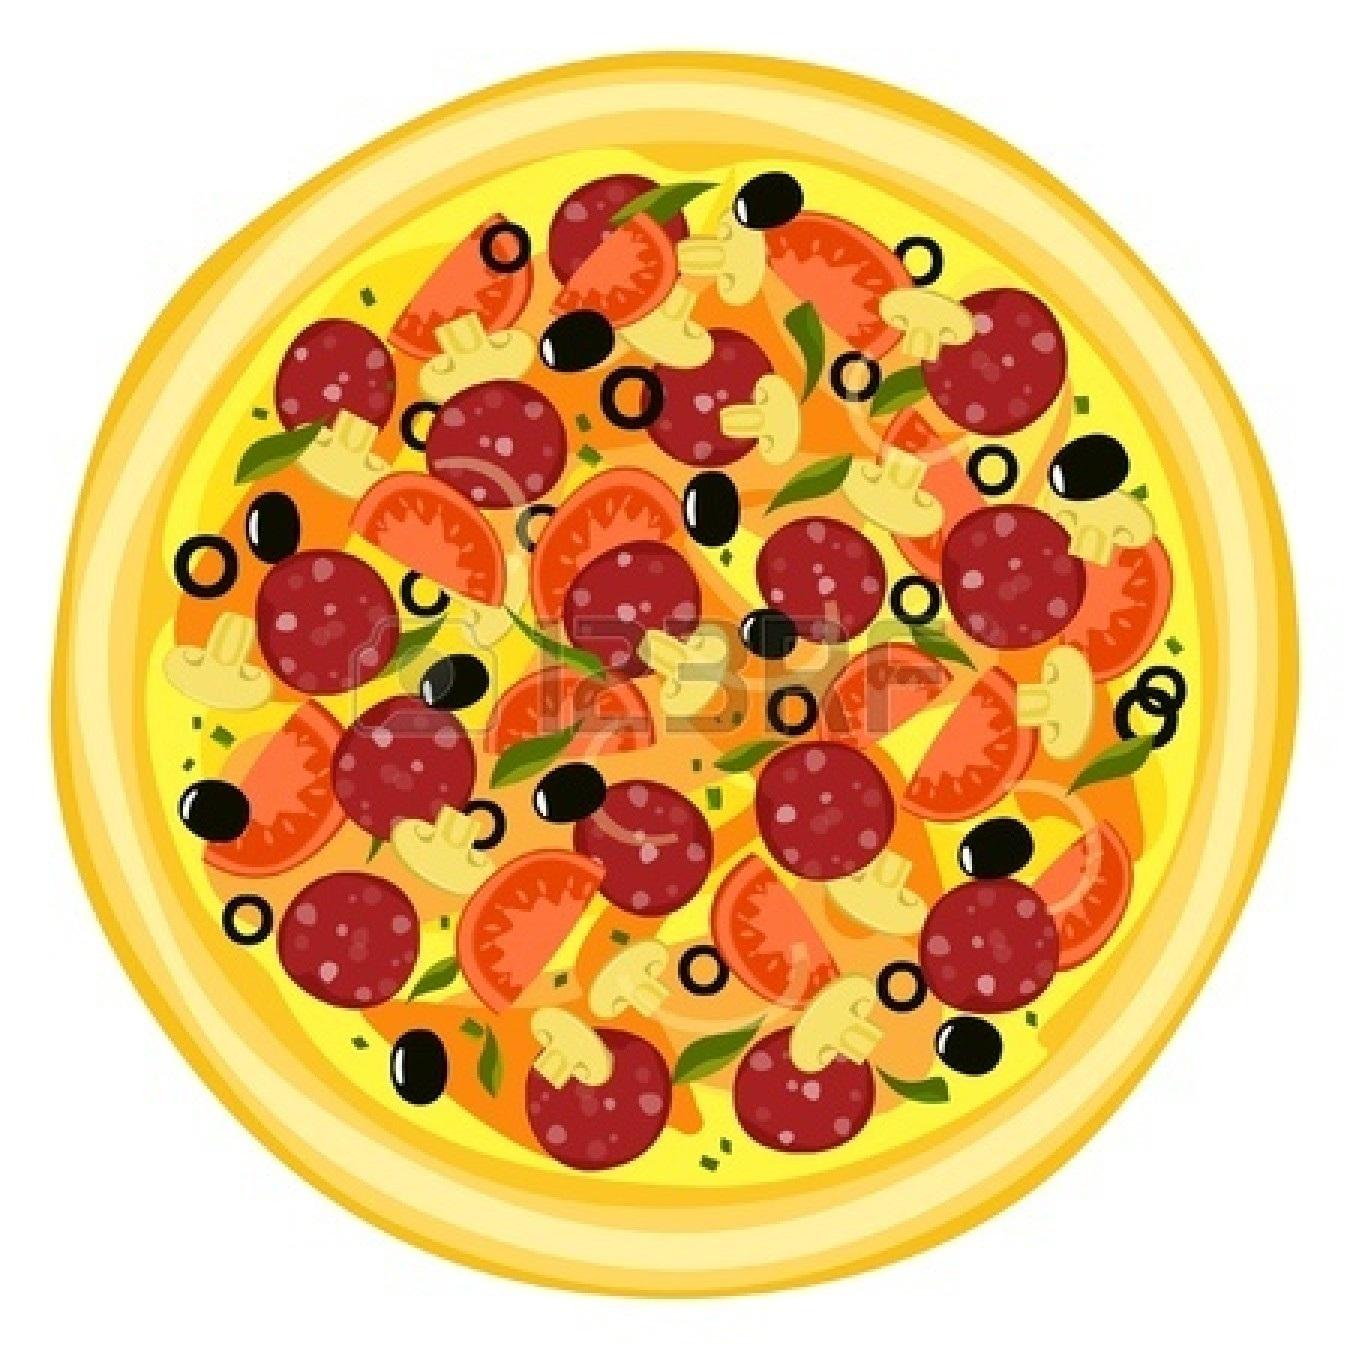 Whole pepperoni pizza clip art .-Whole pepperoni pizza clip art .-8